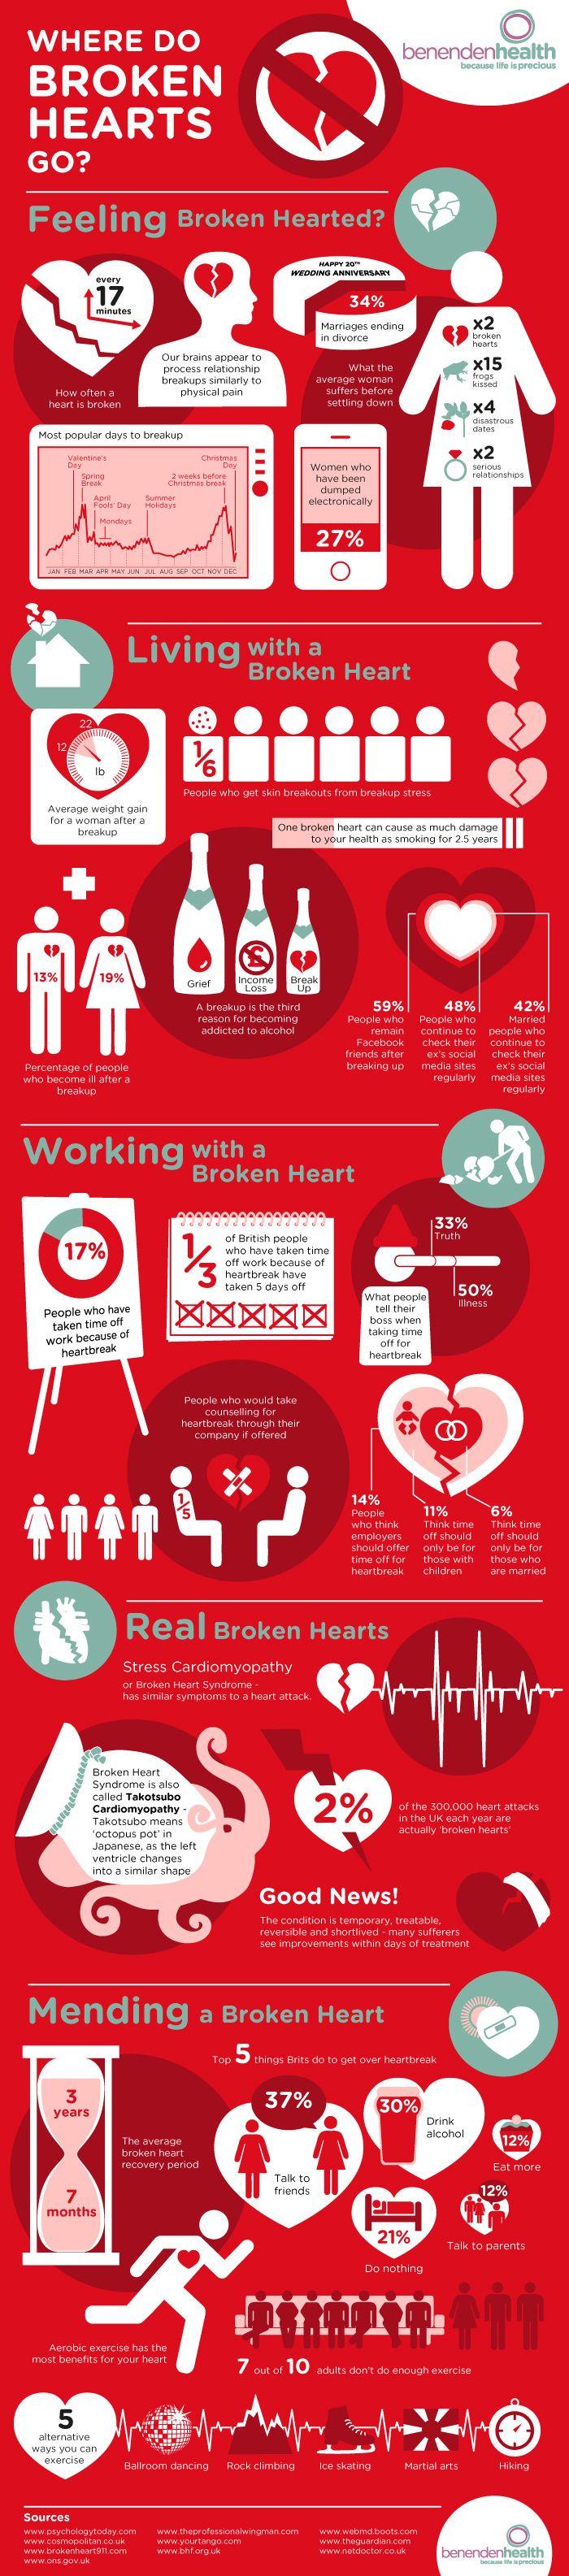 Where Do Broken Hearts Go?  #Infographic #BrokenHearts #Relationships #Health